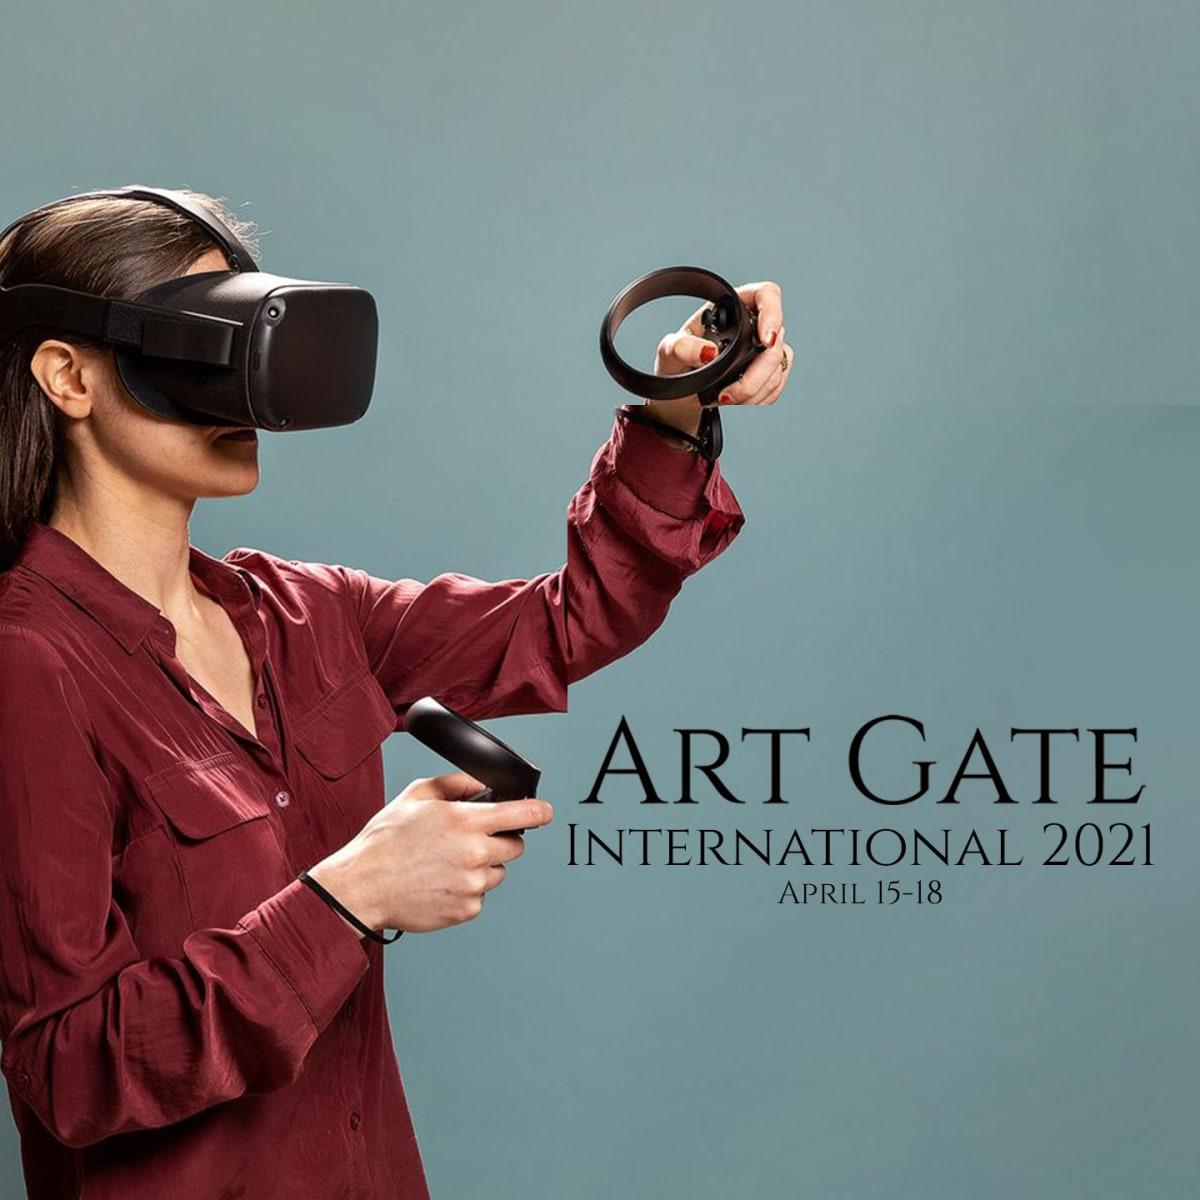 Art Gate International 2021